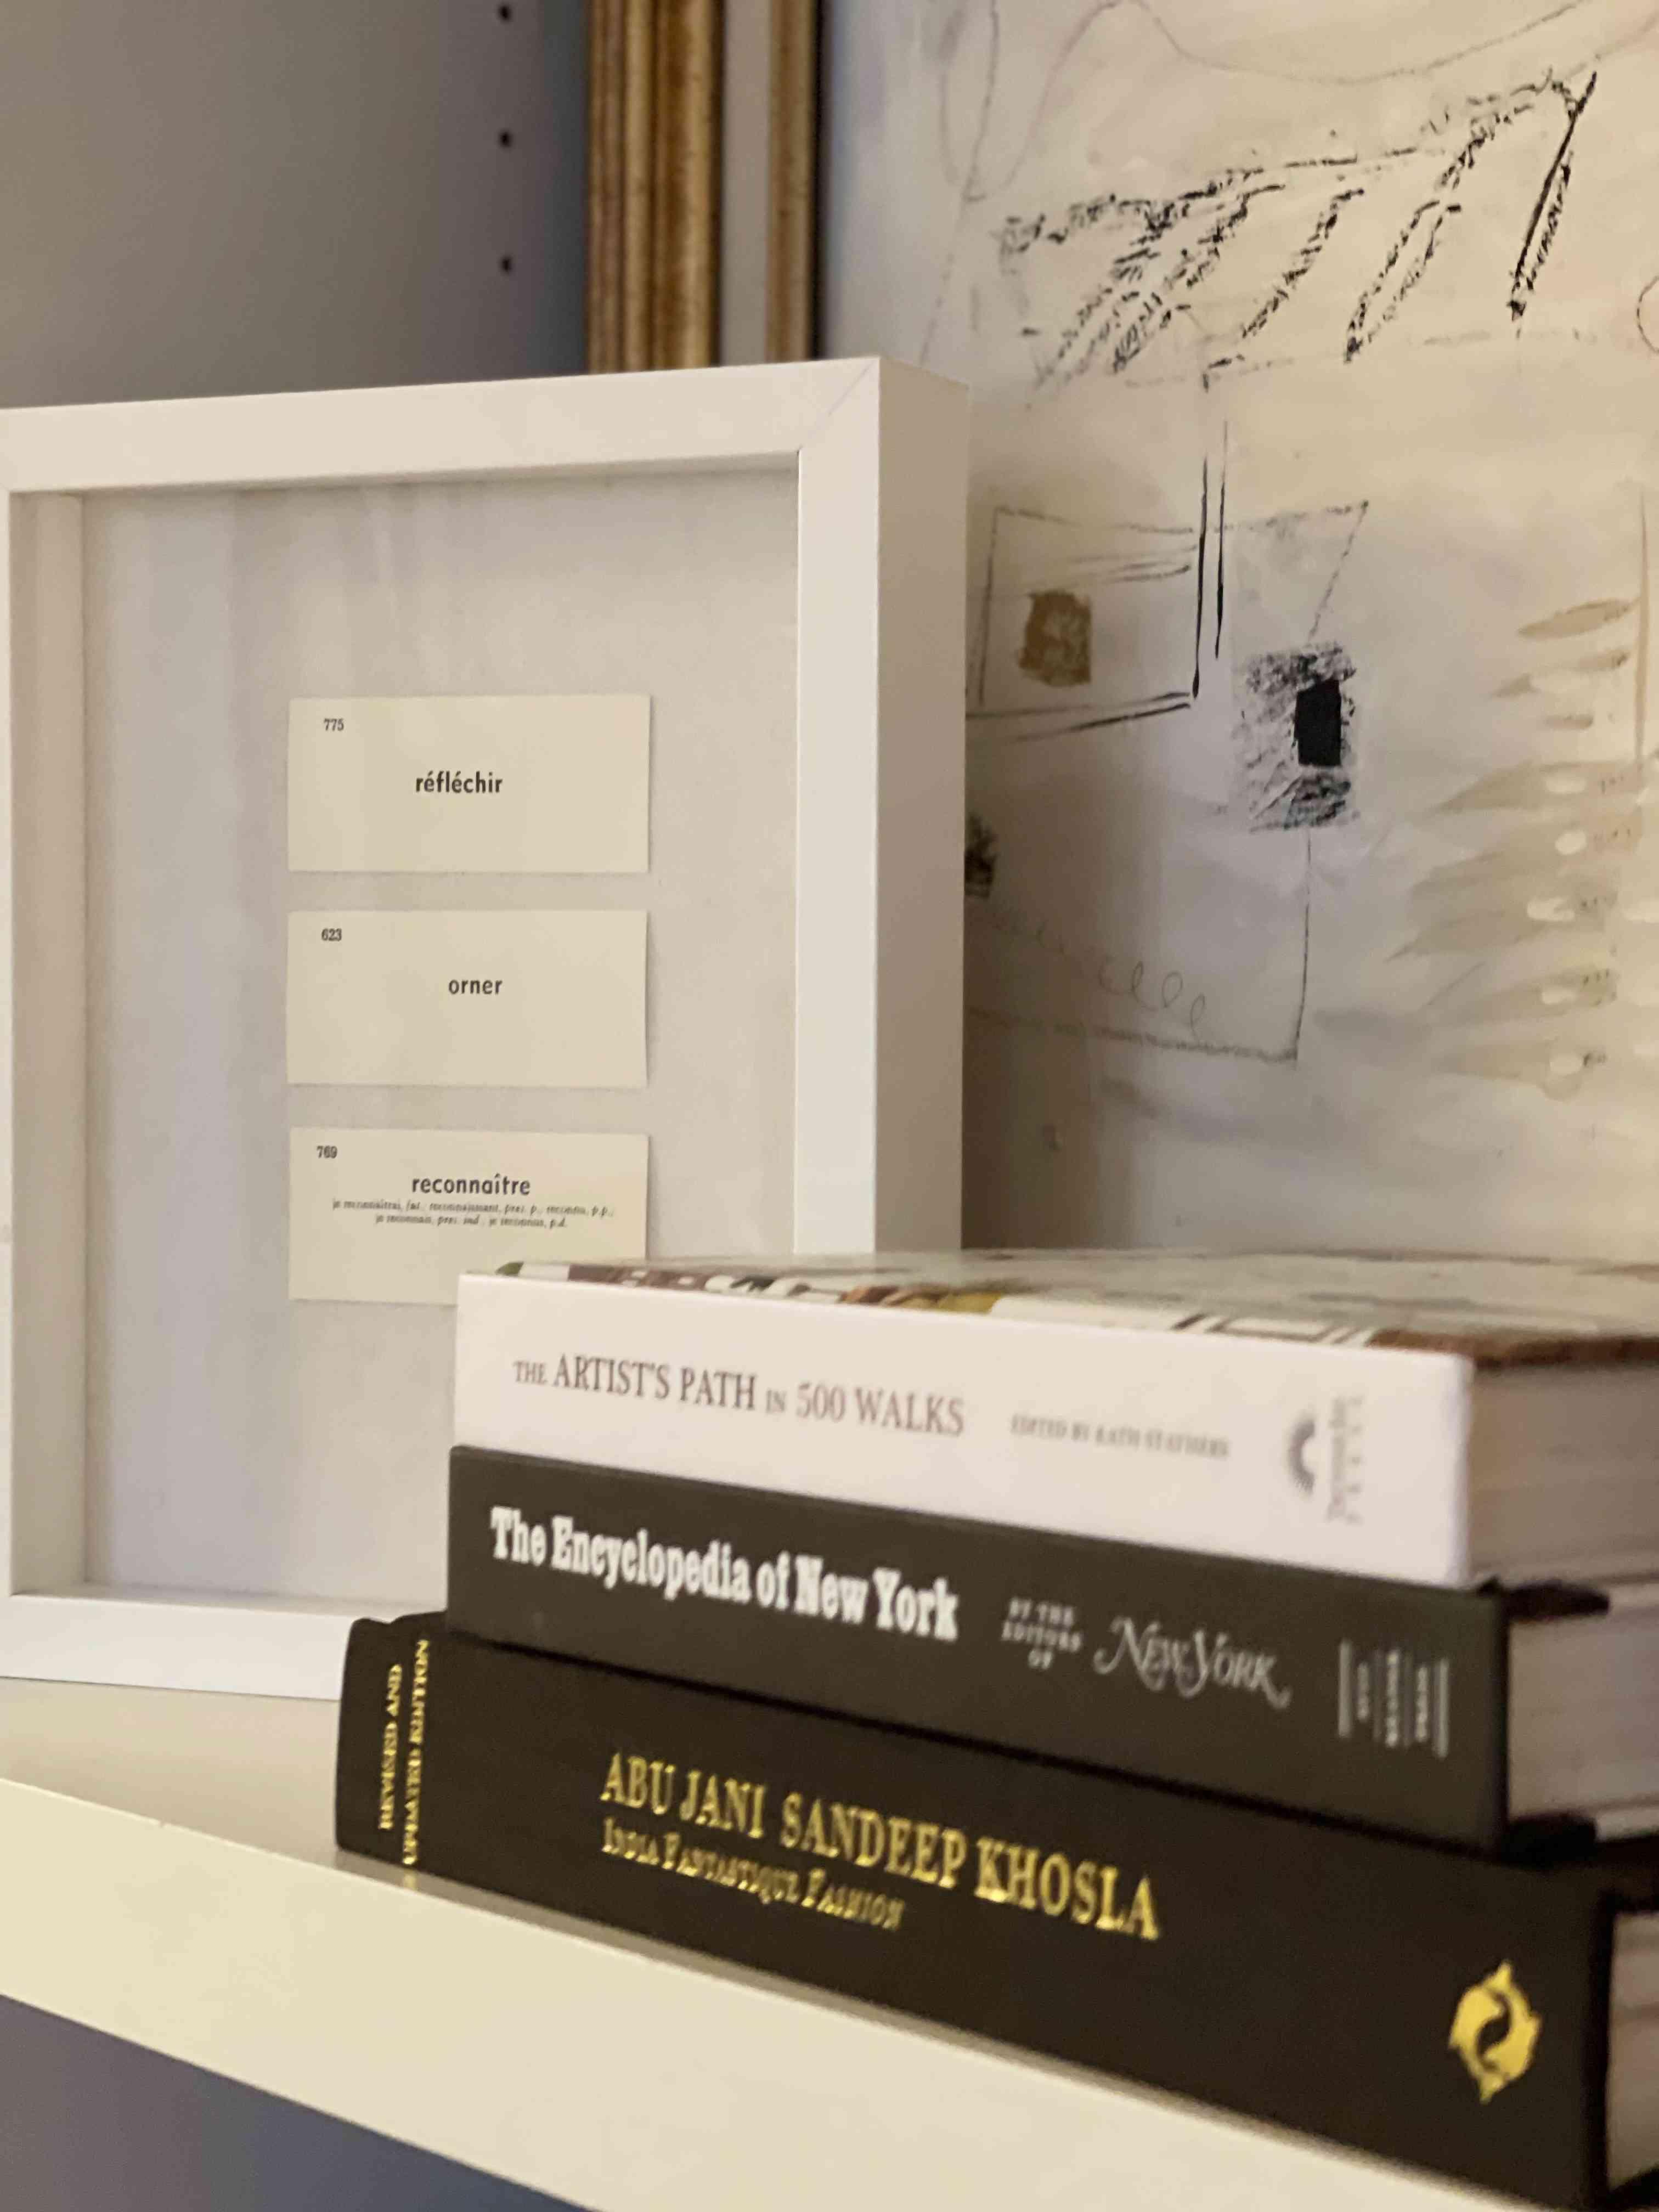 Shadowbox next to coffee table books.